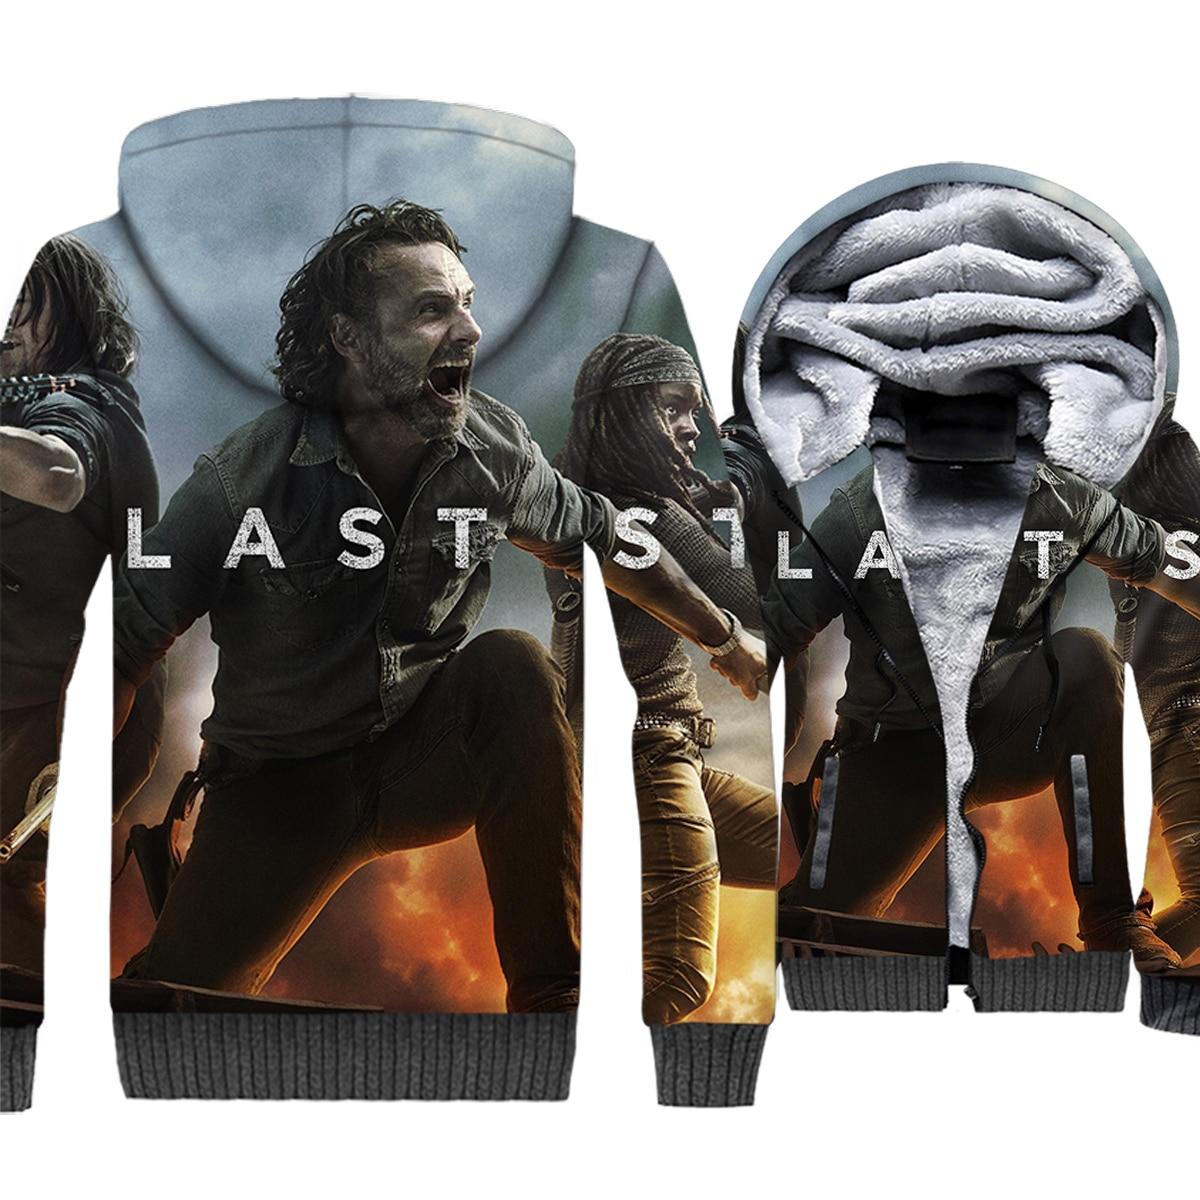 Brand Clothing 2018 Autumn Winter Thick Men 39 s Hoodies Hip Hop Unisex Sweatshirts Harajuku 3D The Walking Dead Movie Jacket Coats in Hoodies amp Sweatshirts from Men 39 s Clothing